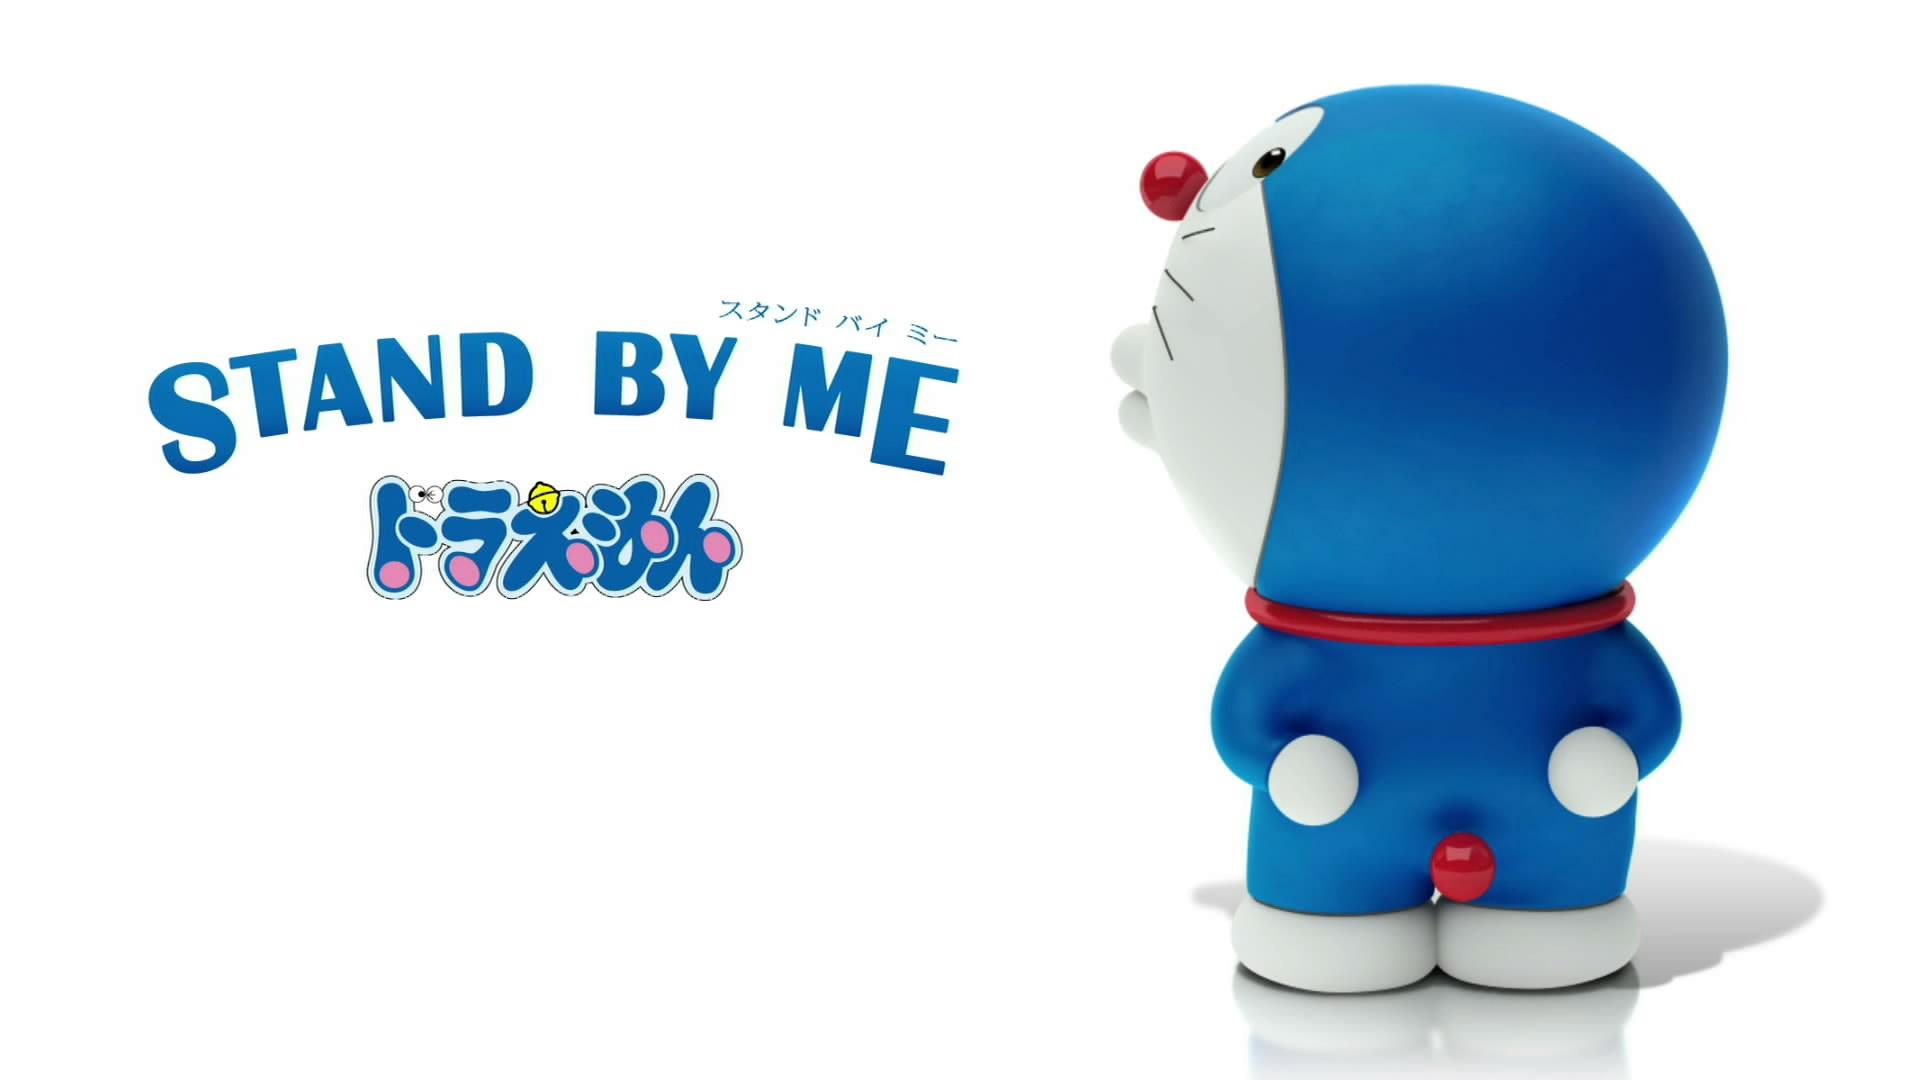 �9�+��ky����a_【【共享壁纸】 哆啦a梦(小新v系列适用)】-【小新】